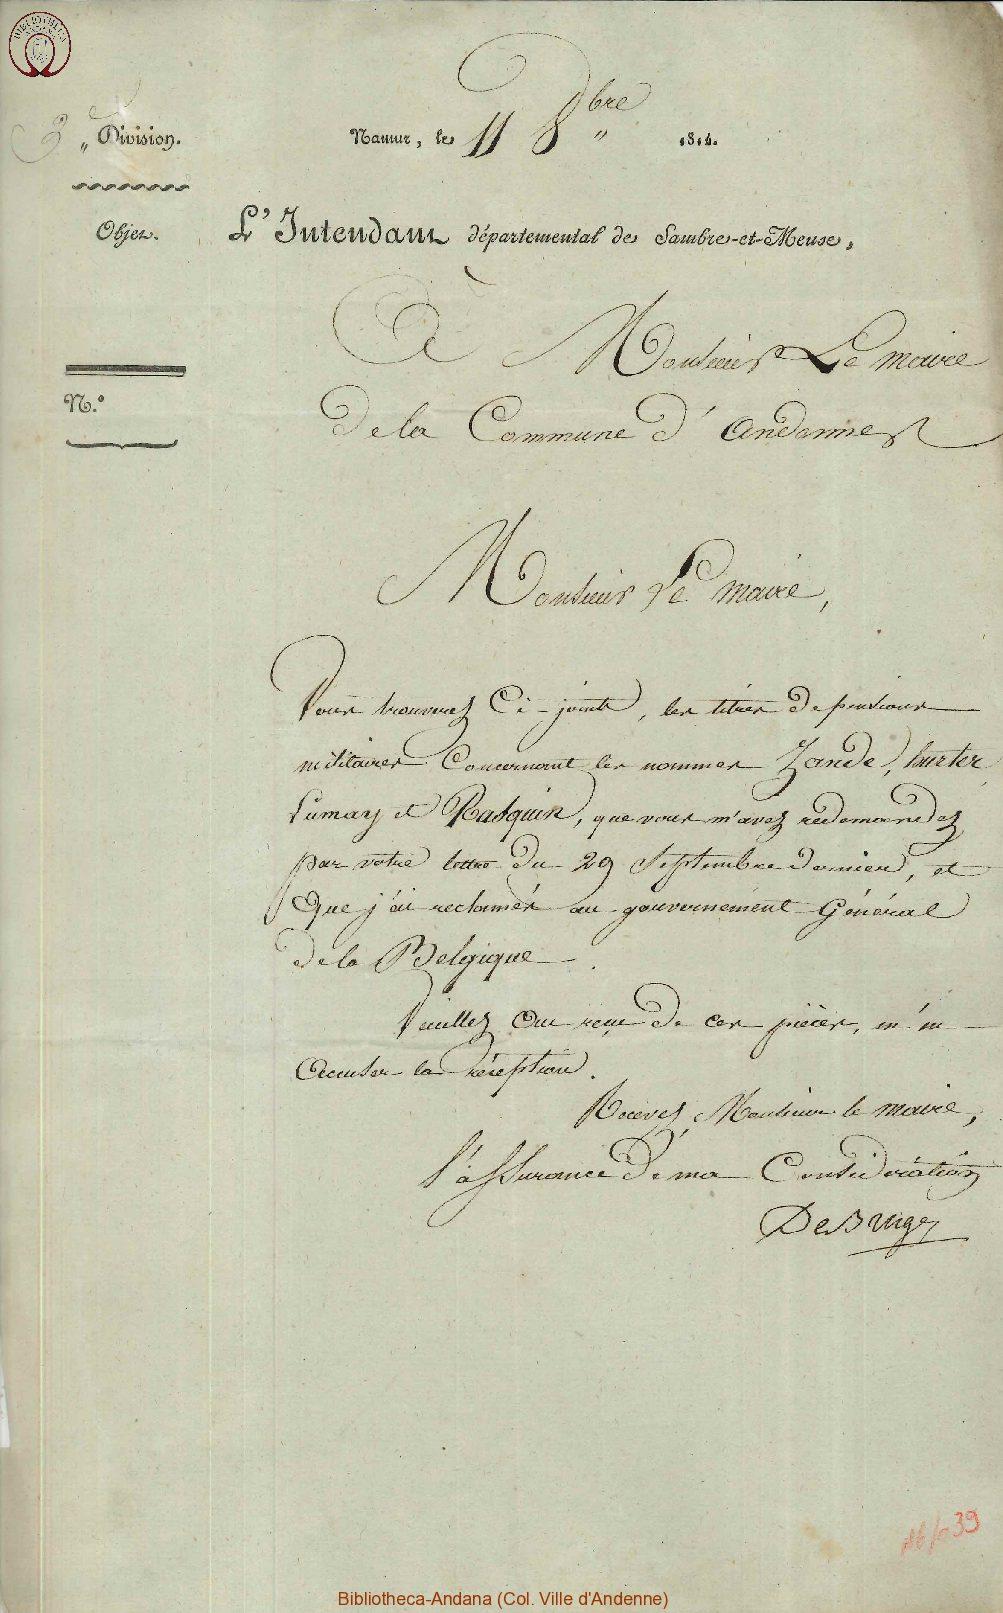 1814-10-11